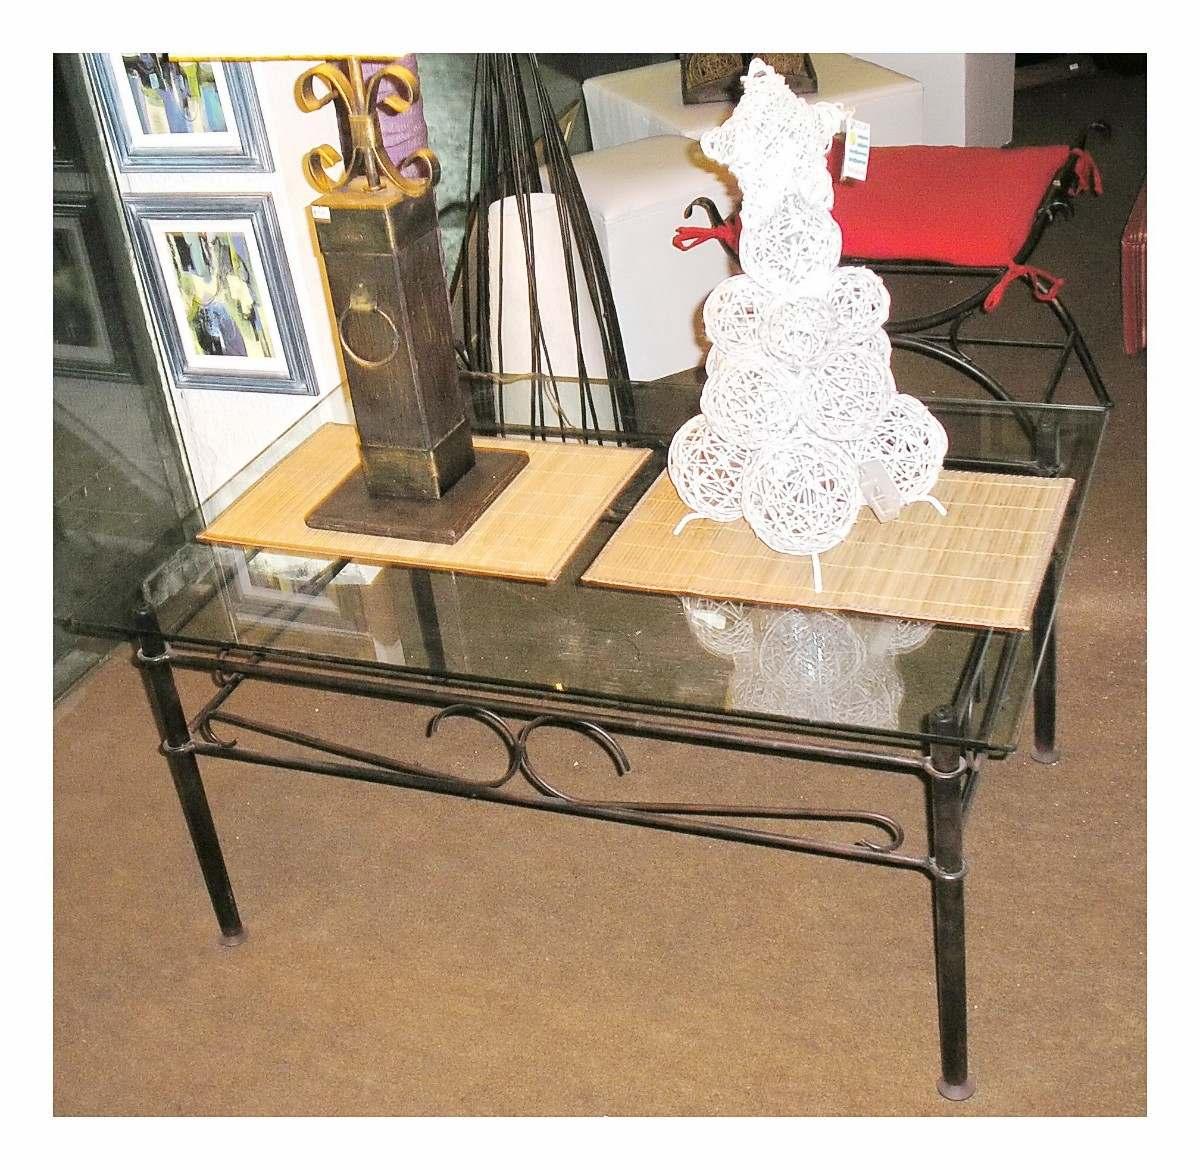 muebles usados hogar muebles y jardn en montevideo On hogar muebles montevideo